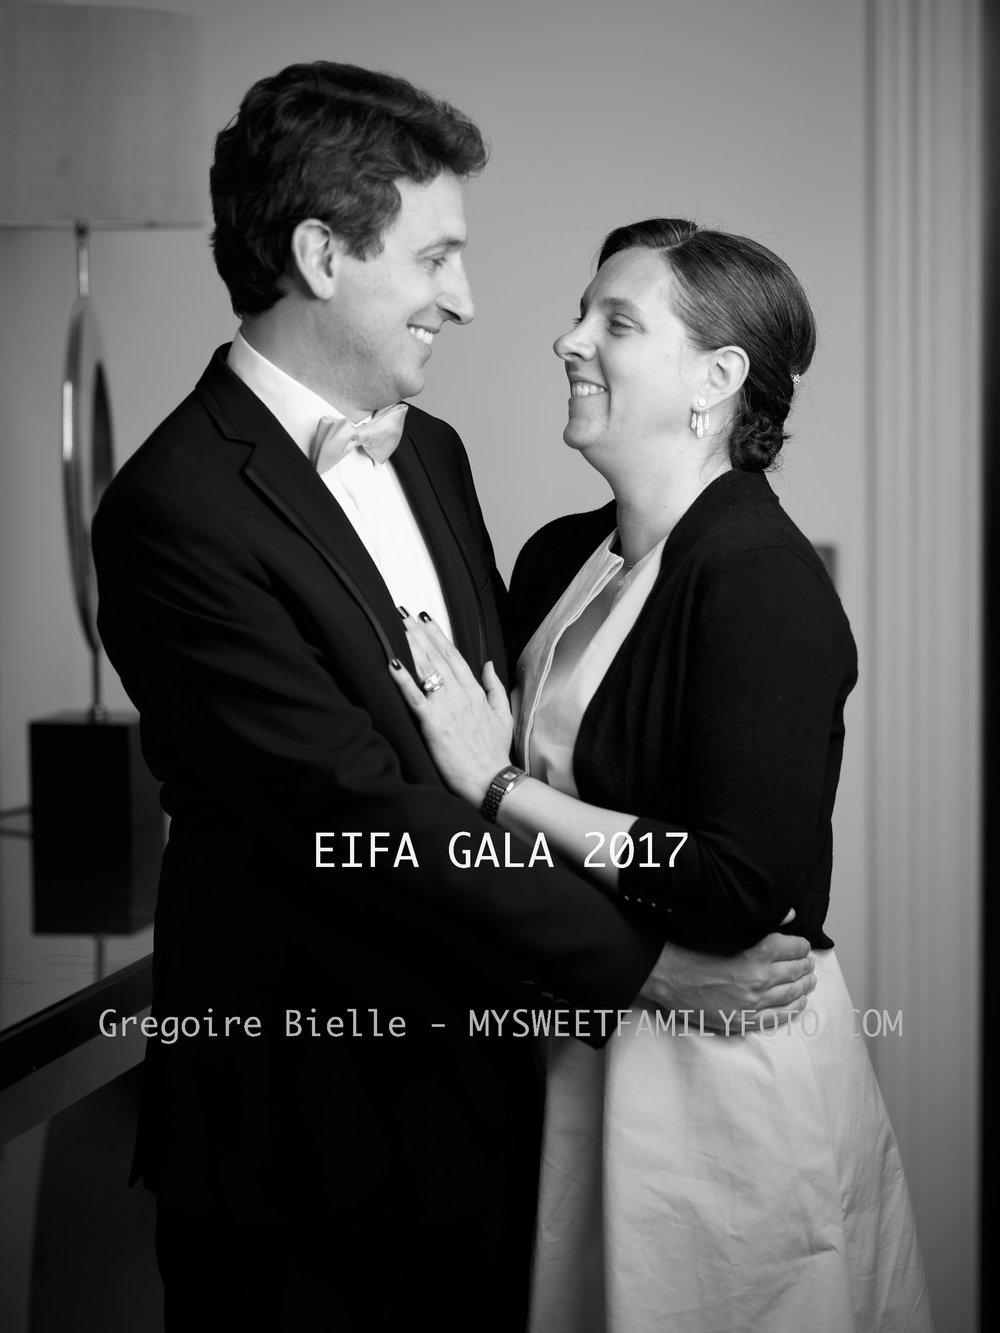 EIFA GALA 1204.jpg